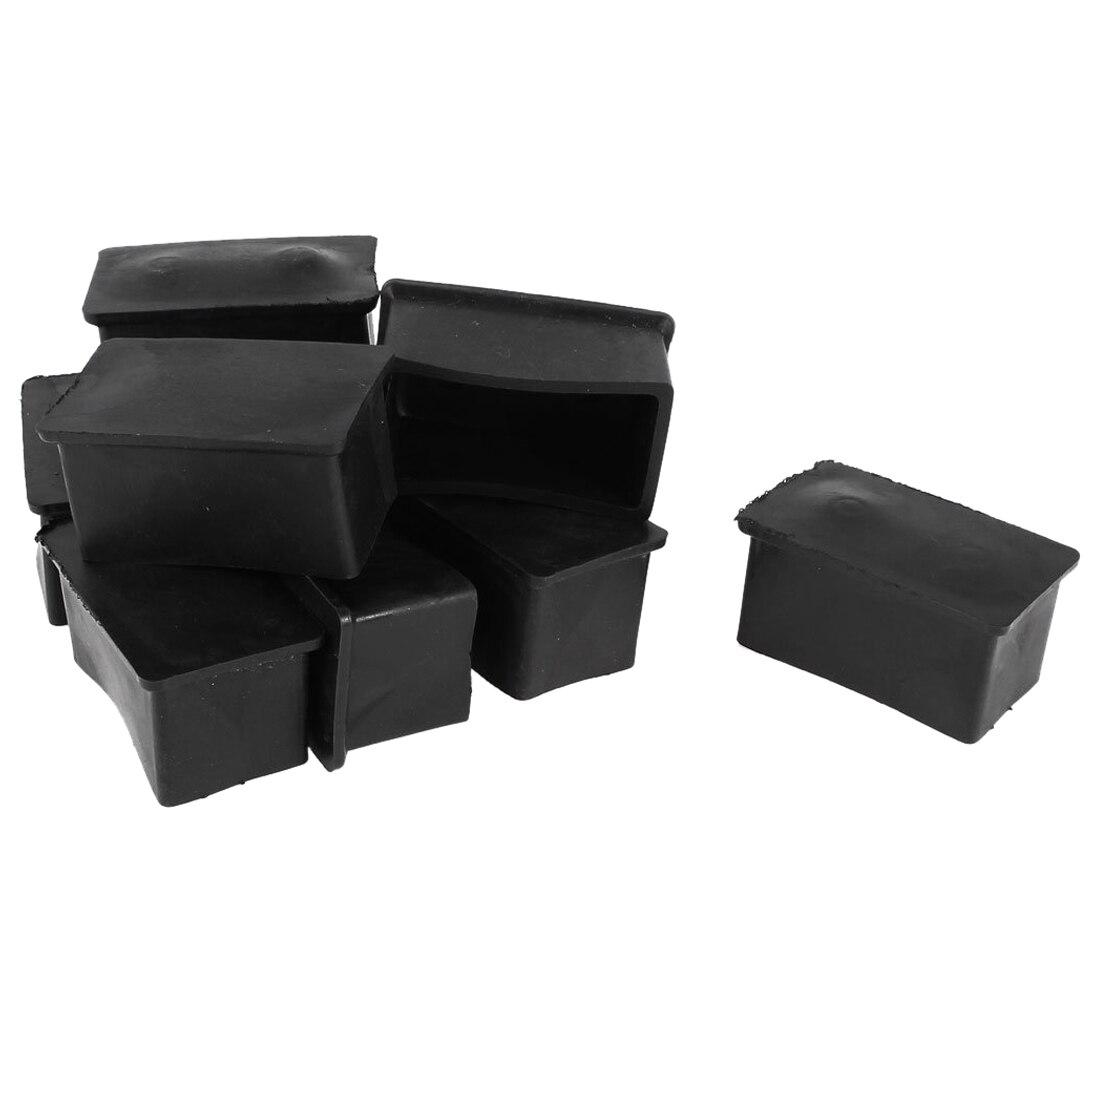 NHBR Rubber Chair Table Foot Cover Furniture Leg Protectors 25x50mm 10 Pcs 2 sets lot furniture square shape foot skid glide slide pad nail protectors 50pcs